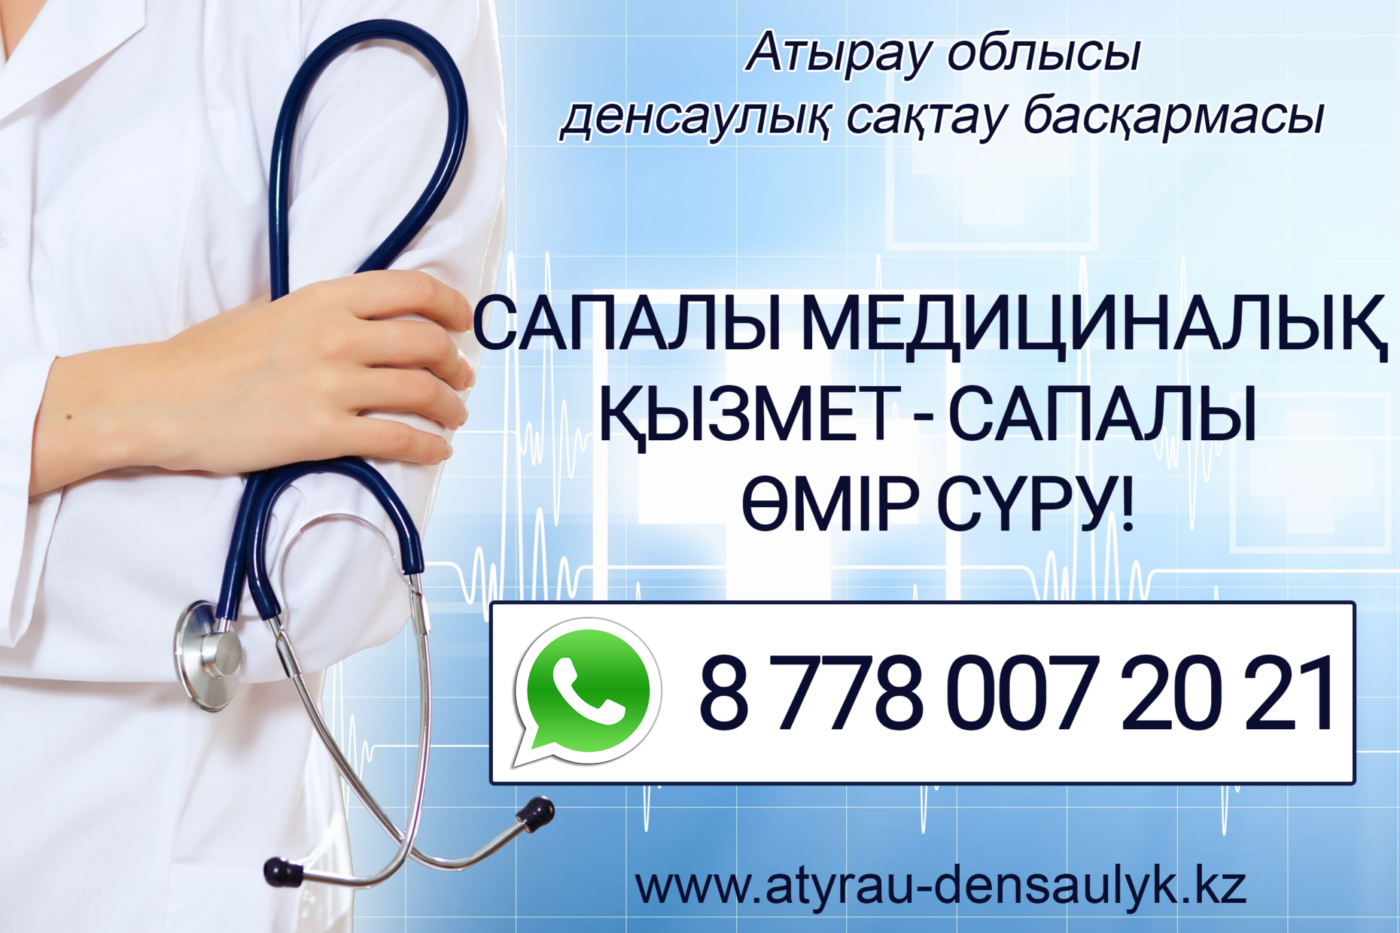 atyraumed-kk-1400x933